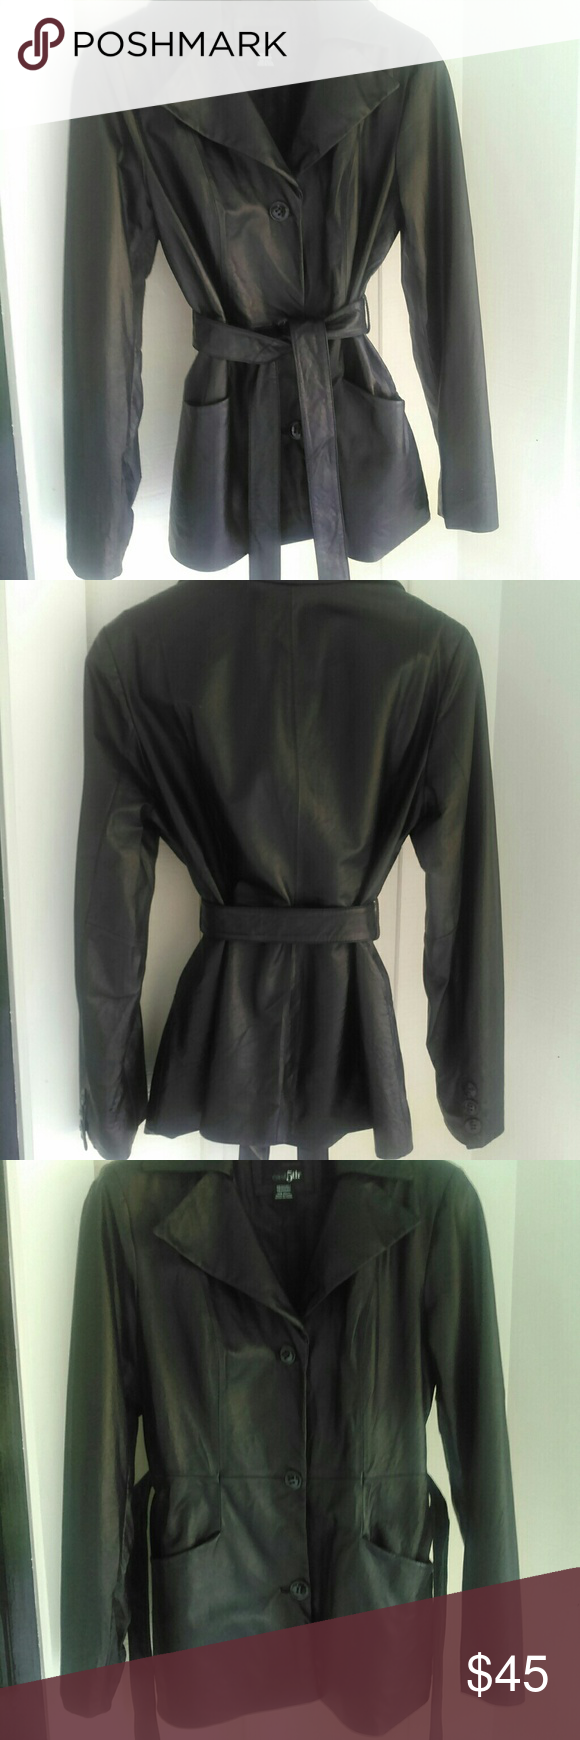 Black vintage genuine leather jacket Black ,genuine